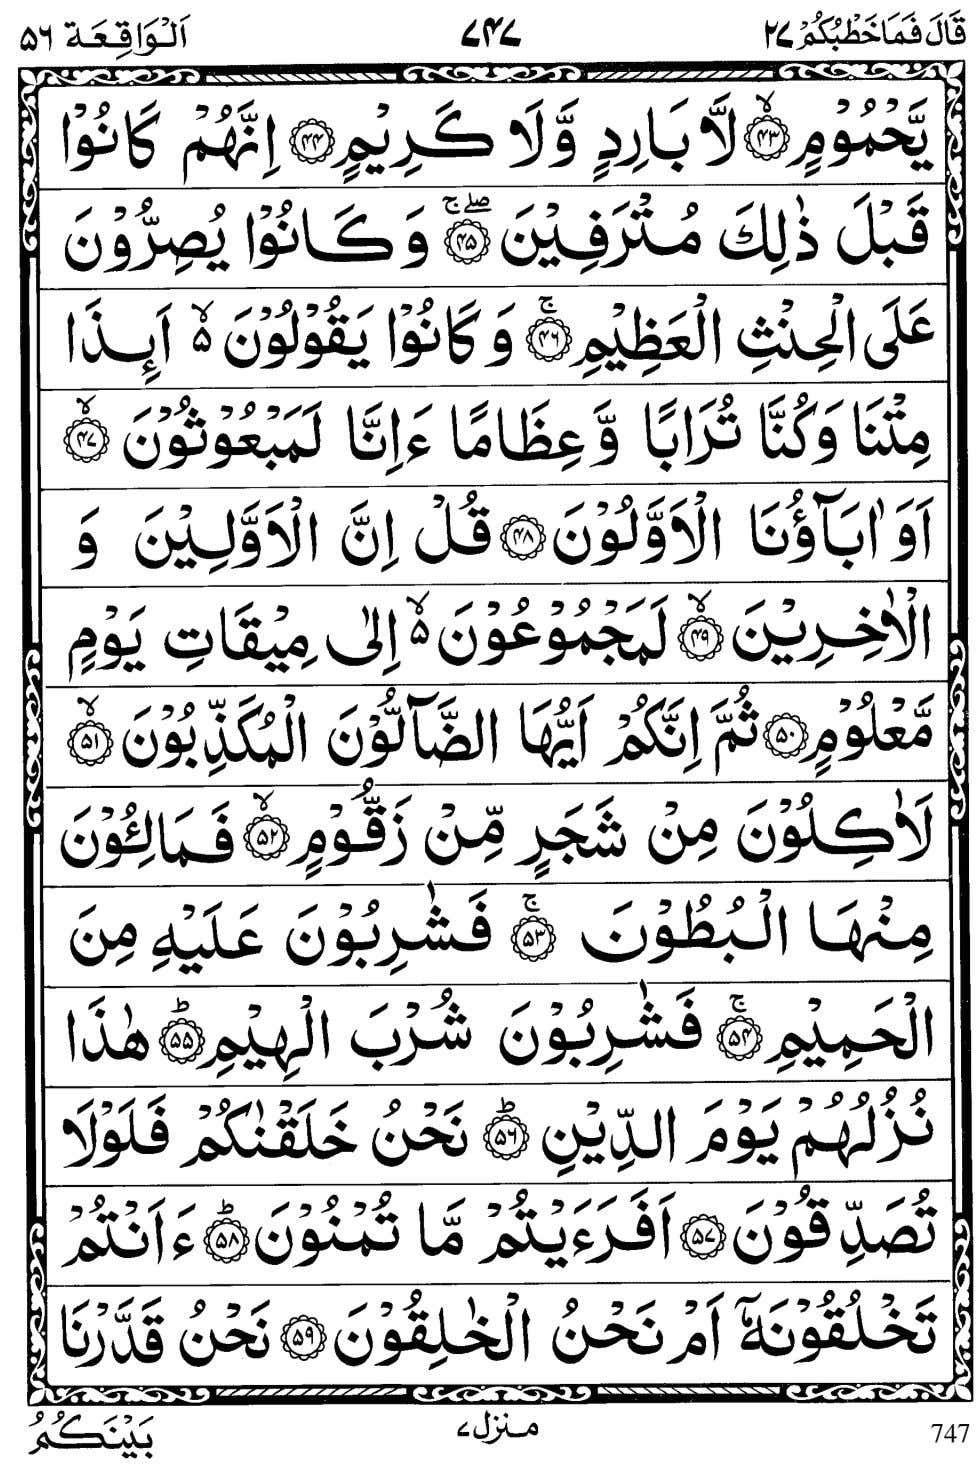 Surah Al Waqiah Arab In 2021 Quran Verses Islamic Messages Verses